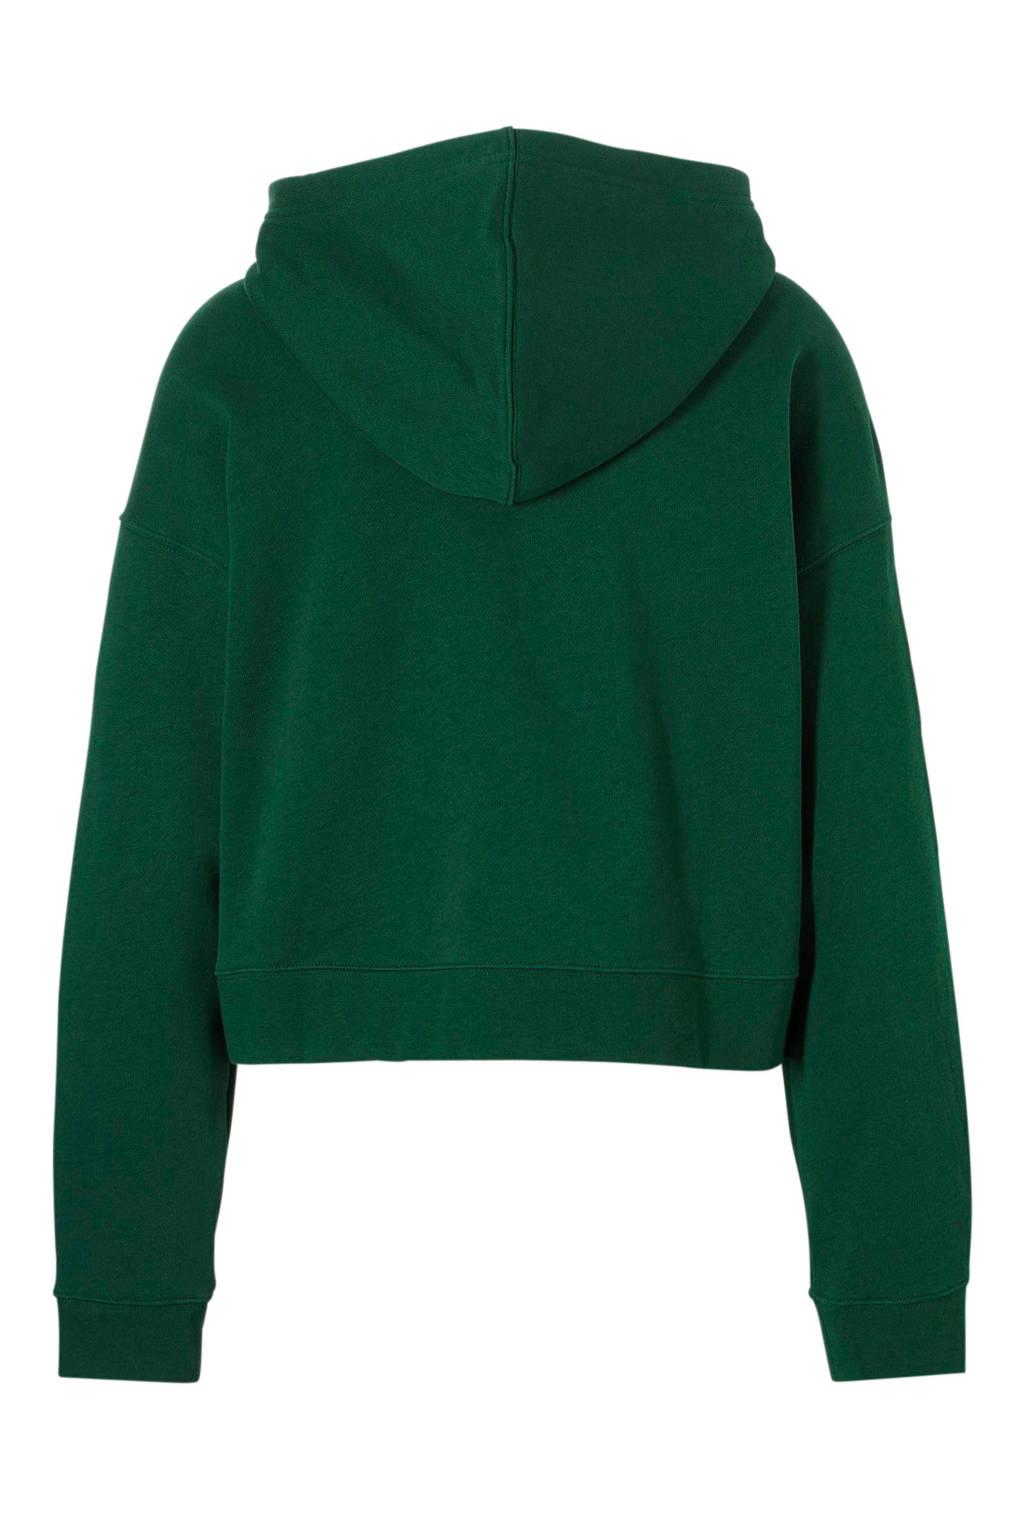 adidas originals hoodie groen, Groen/wit